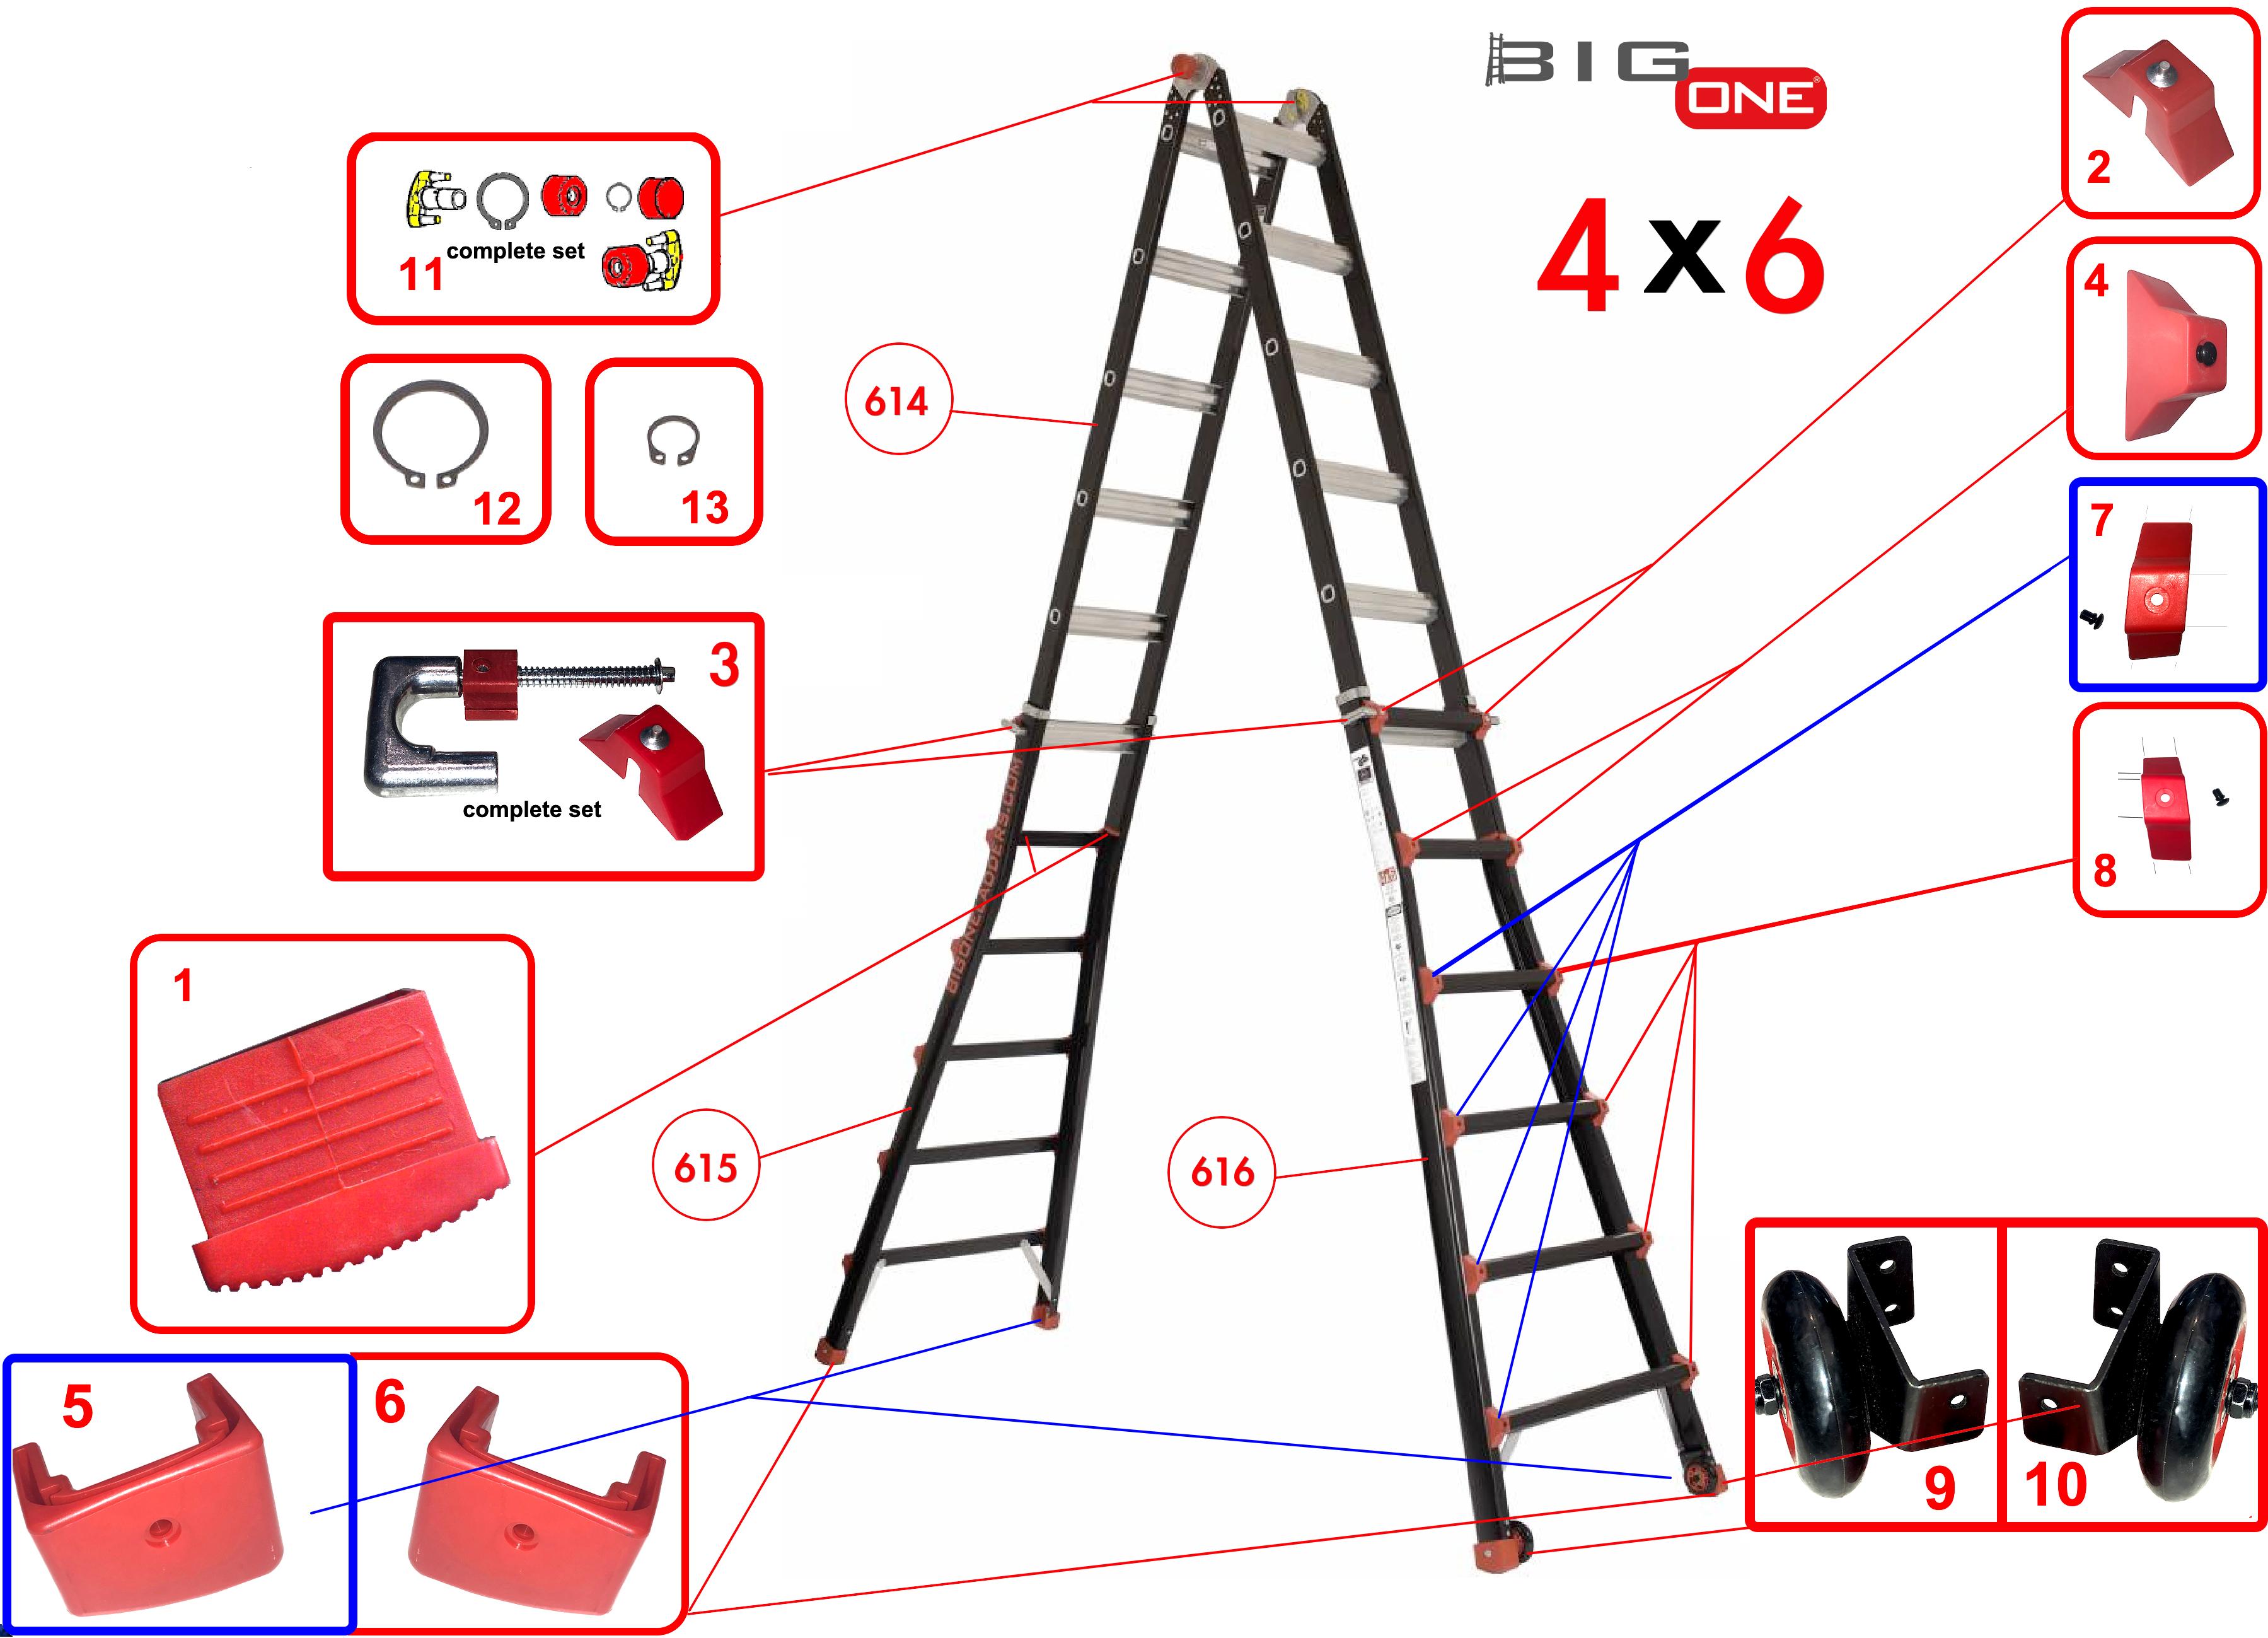 onderdelenlijst_bigoneladdder-4x6